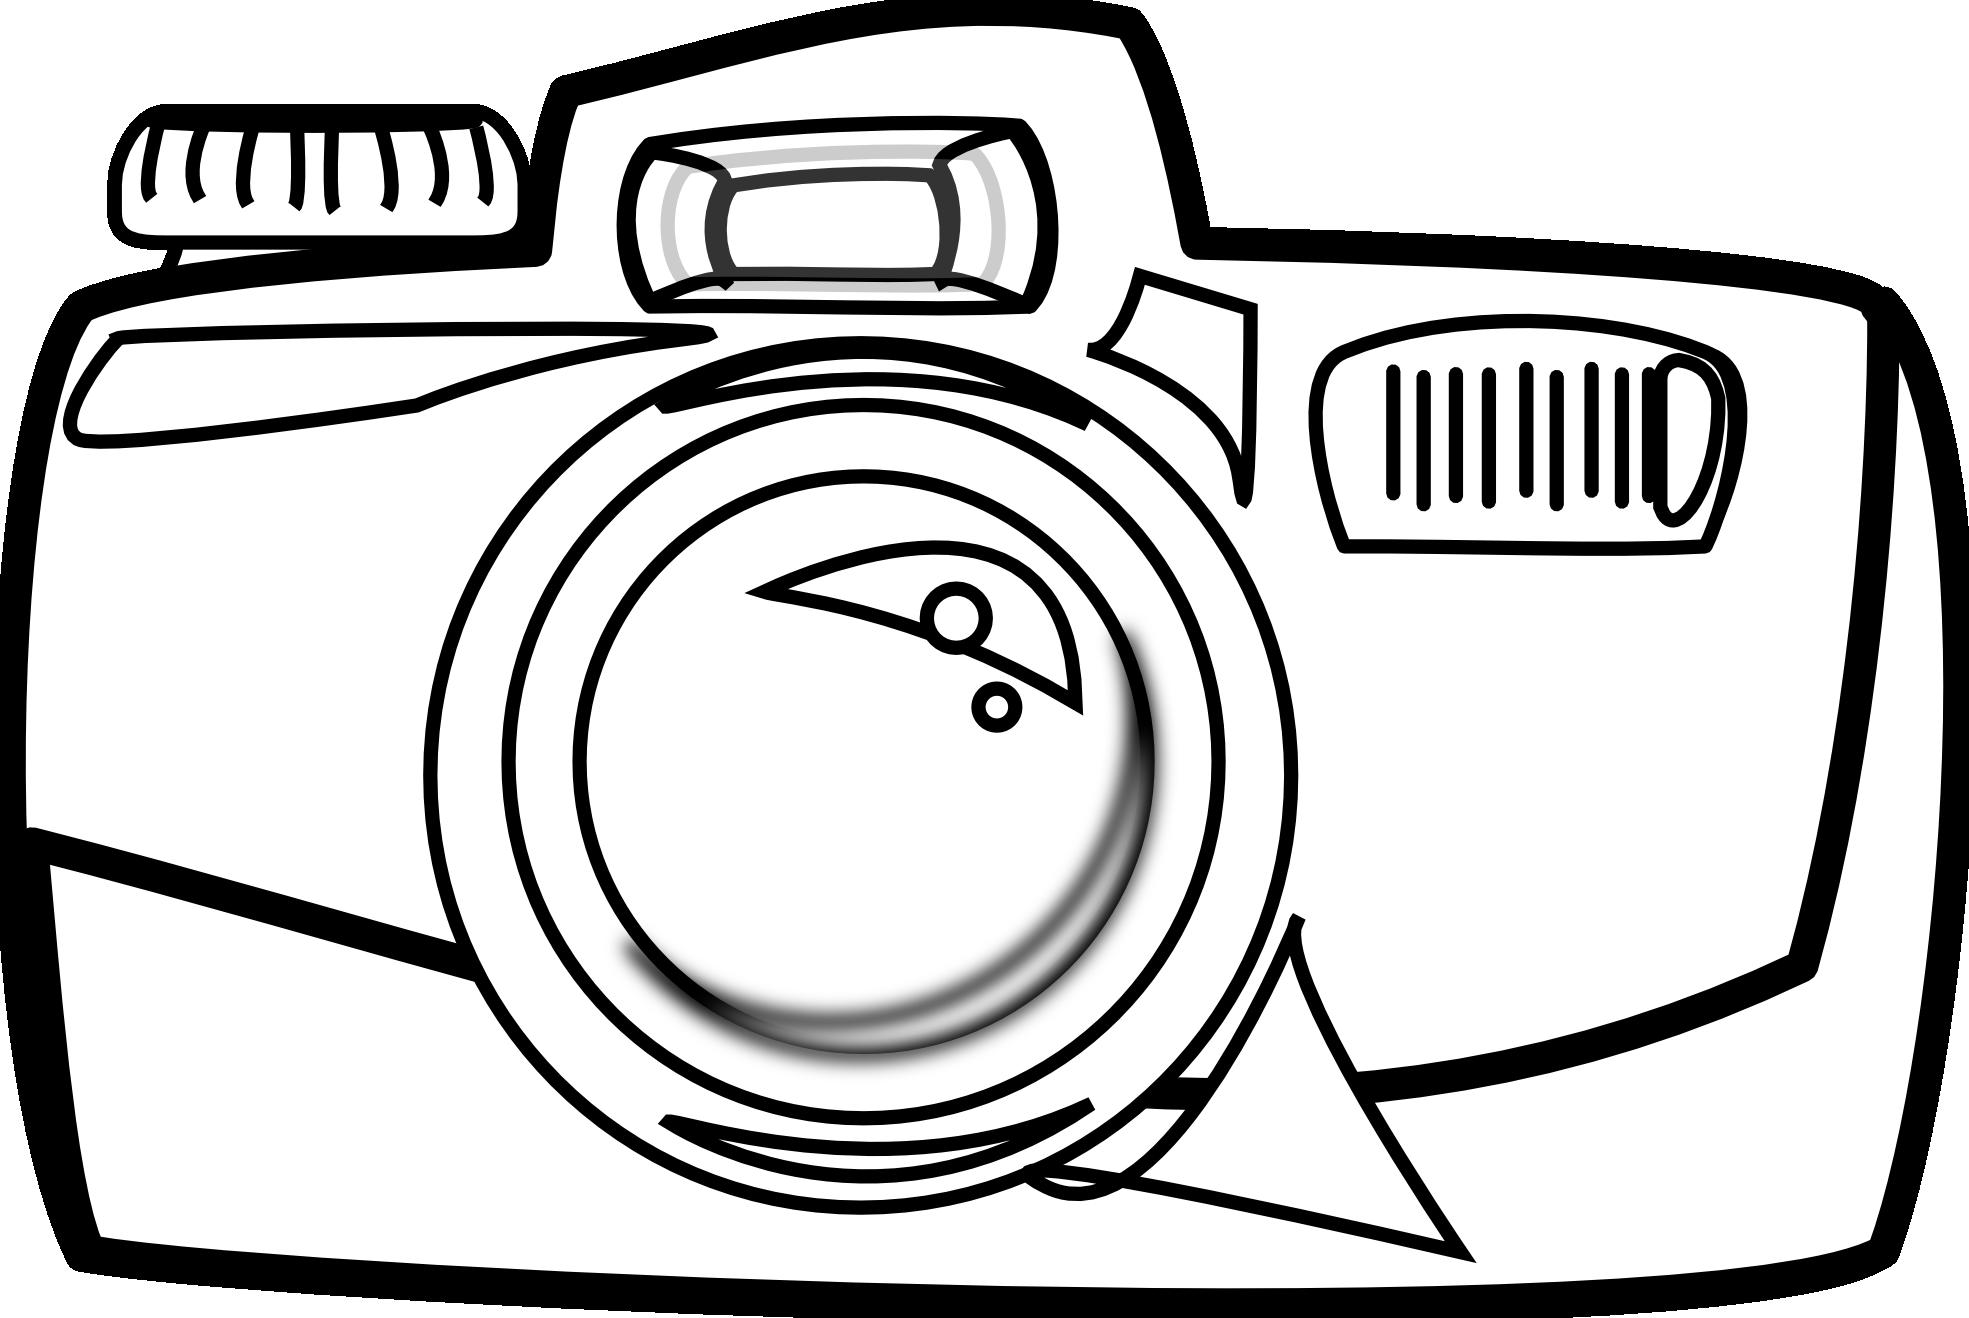 ... Camera Clipart Black And White | Clipart Panda - Free Clipart Images: www.clipartpanda.com/categories/vintage-camera-clipart-black-and-white